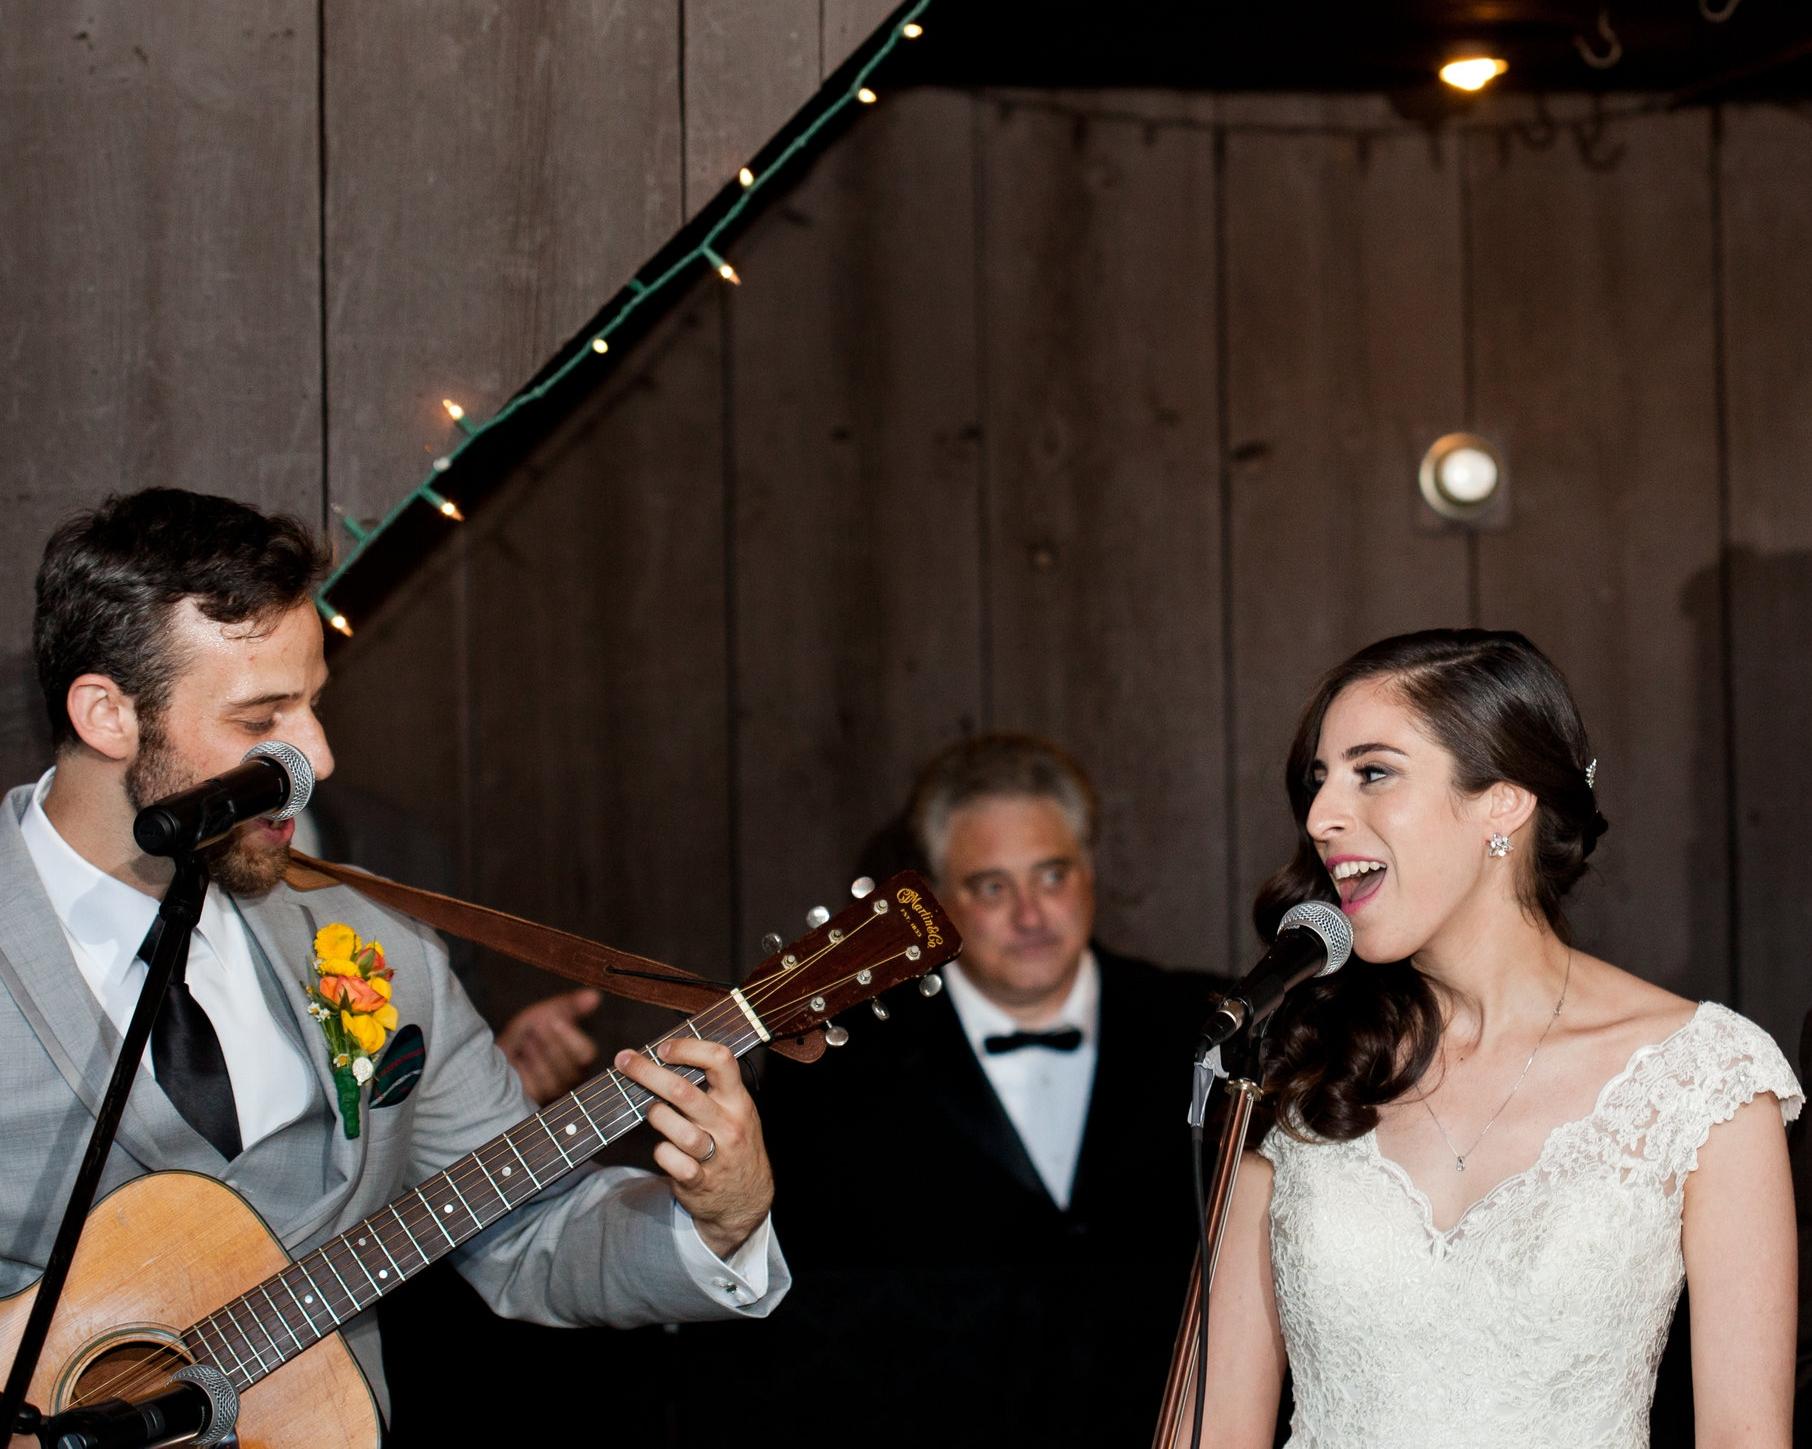 performing with david wedding 2.jpeg